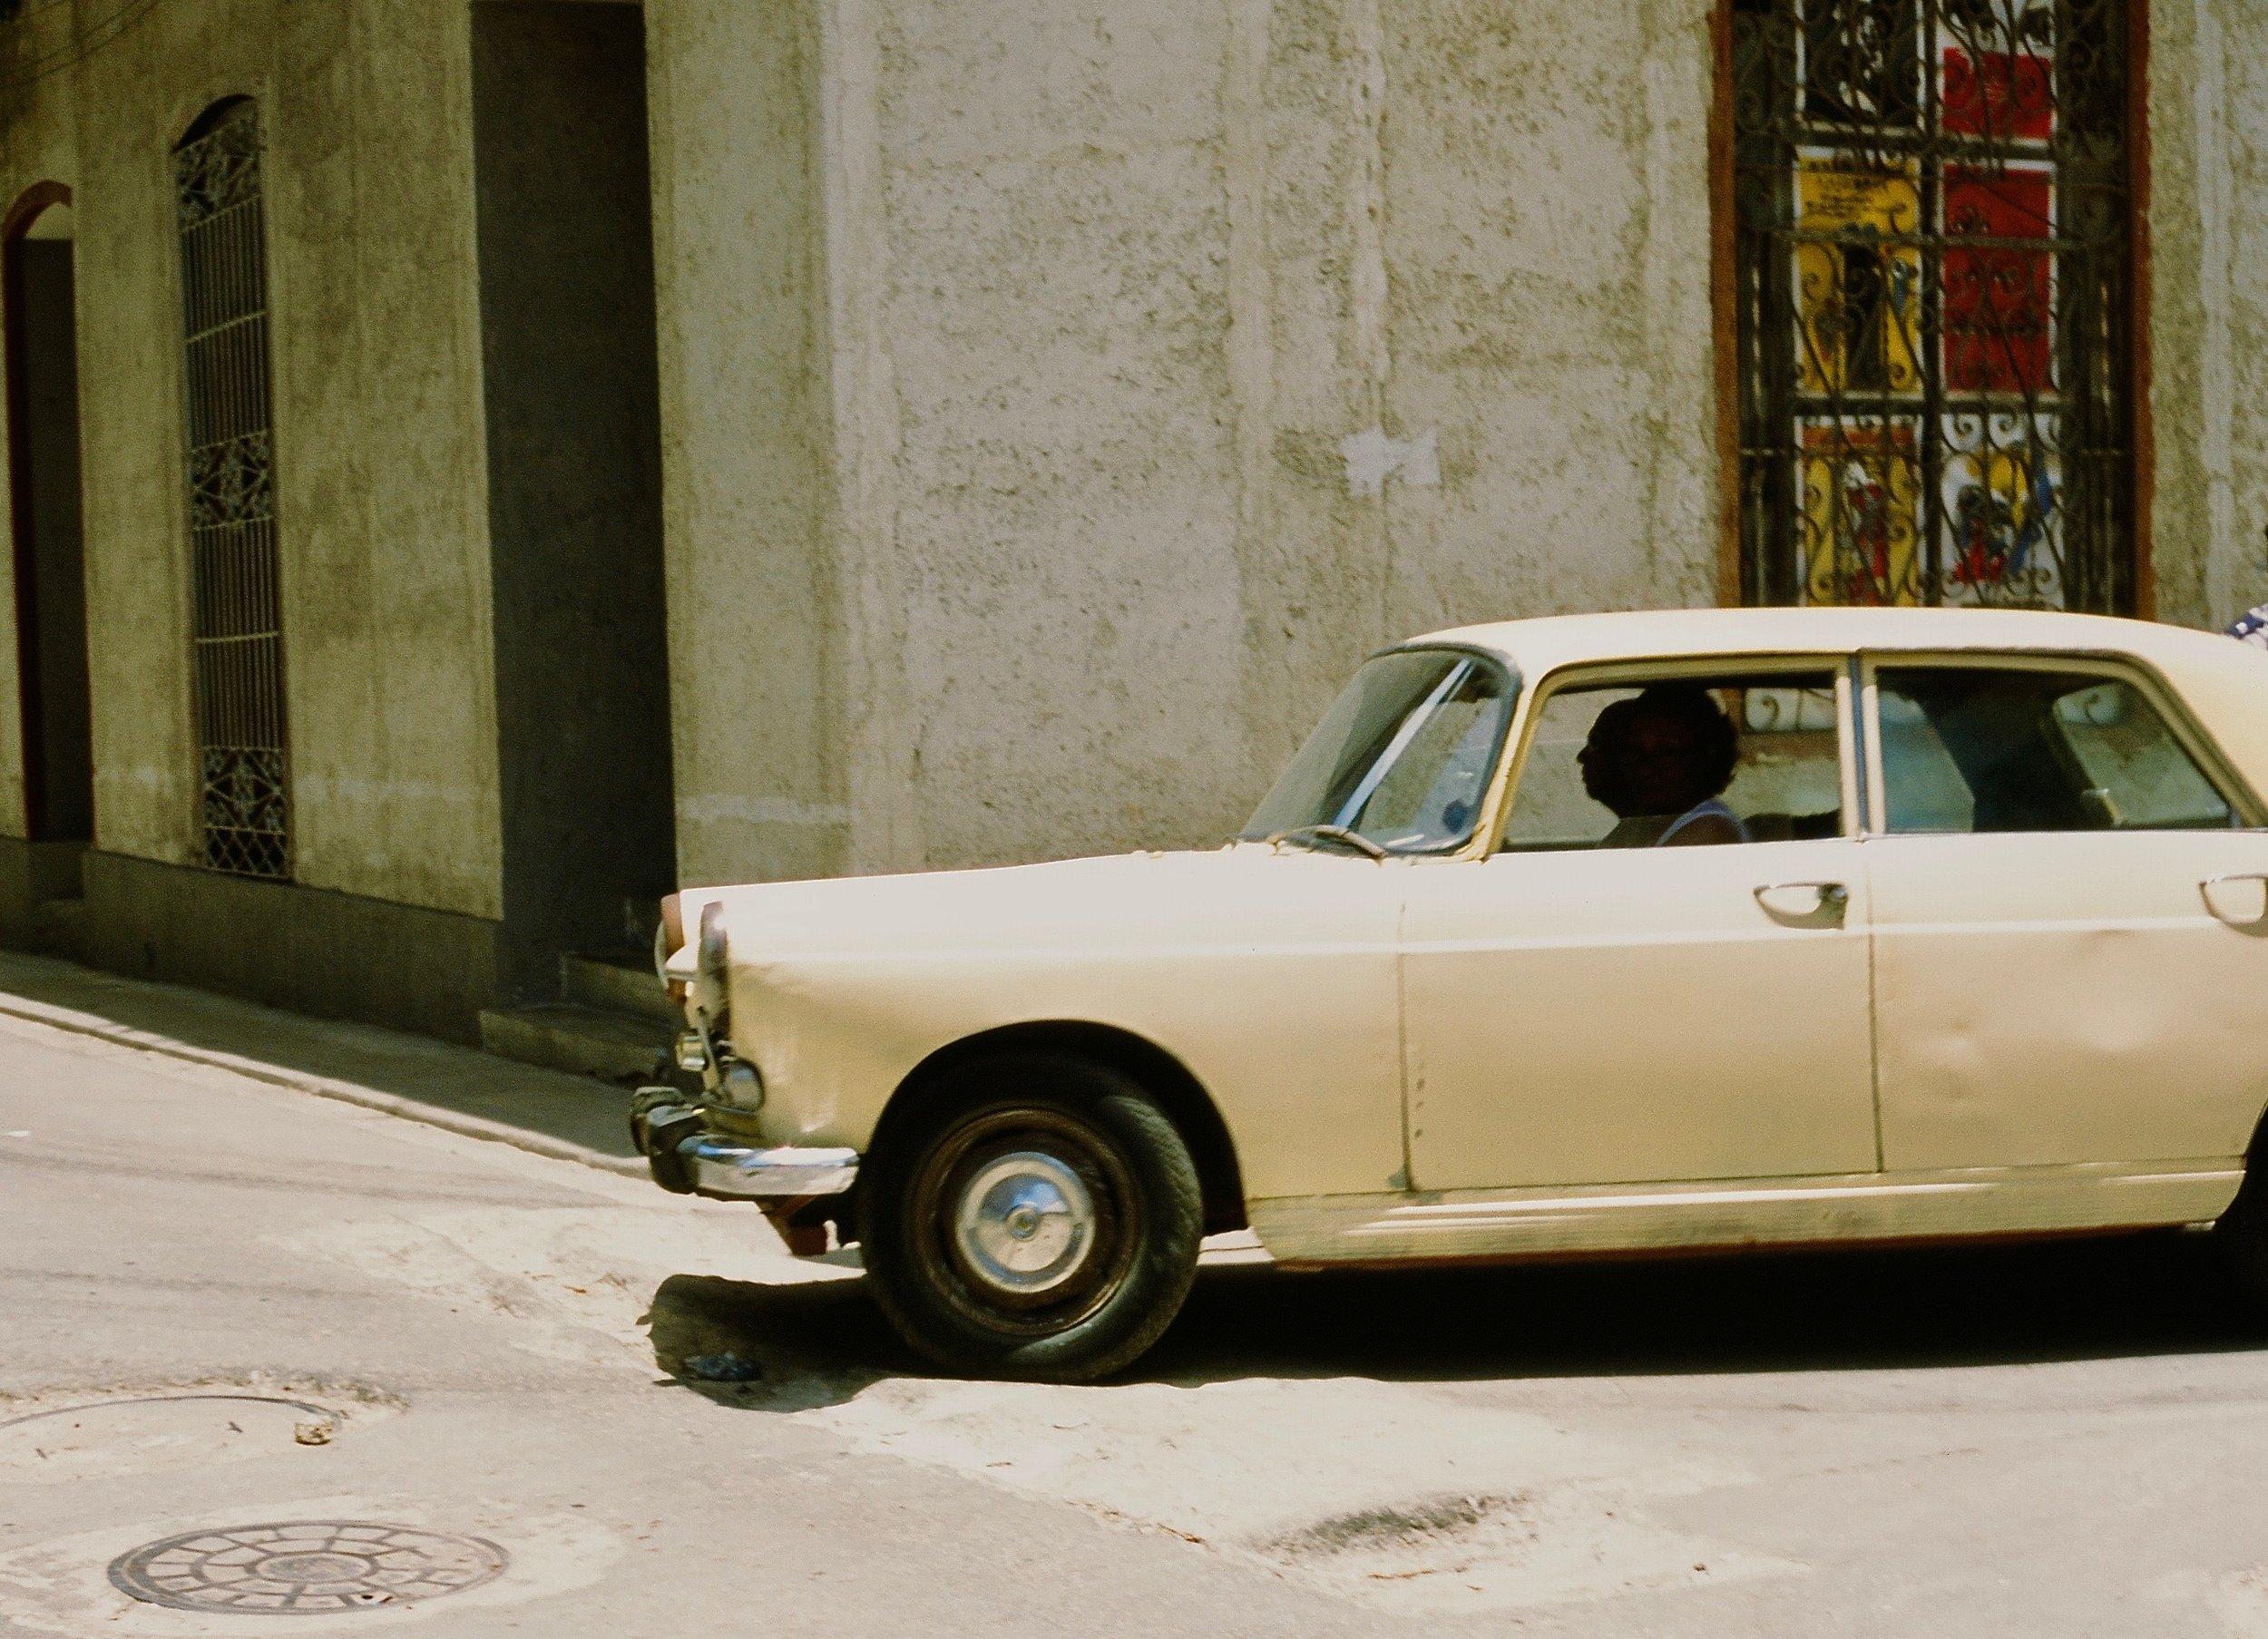 Havana Cuba Travel GLDN Jewelry